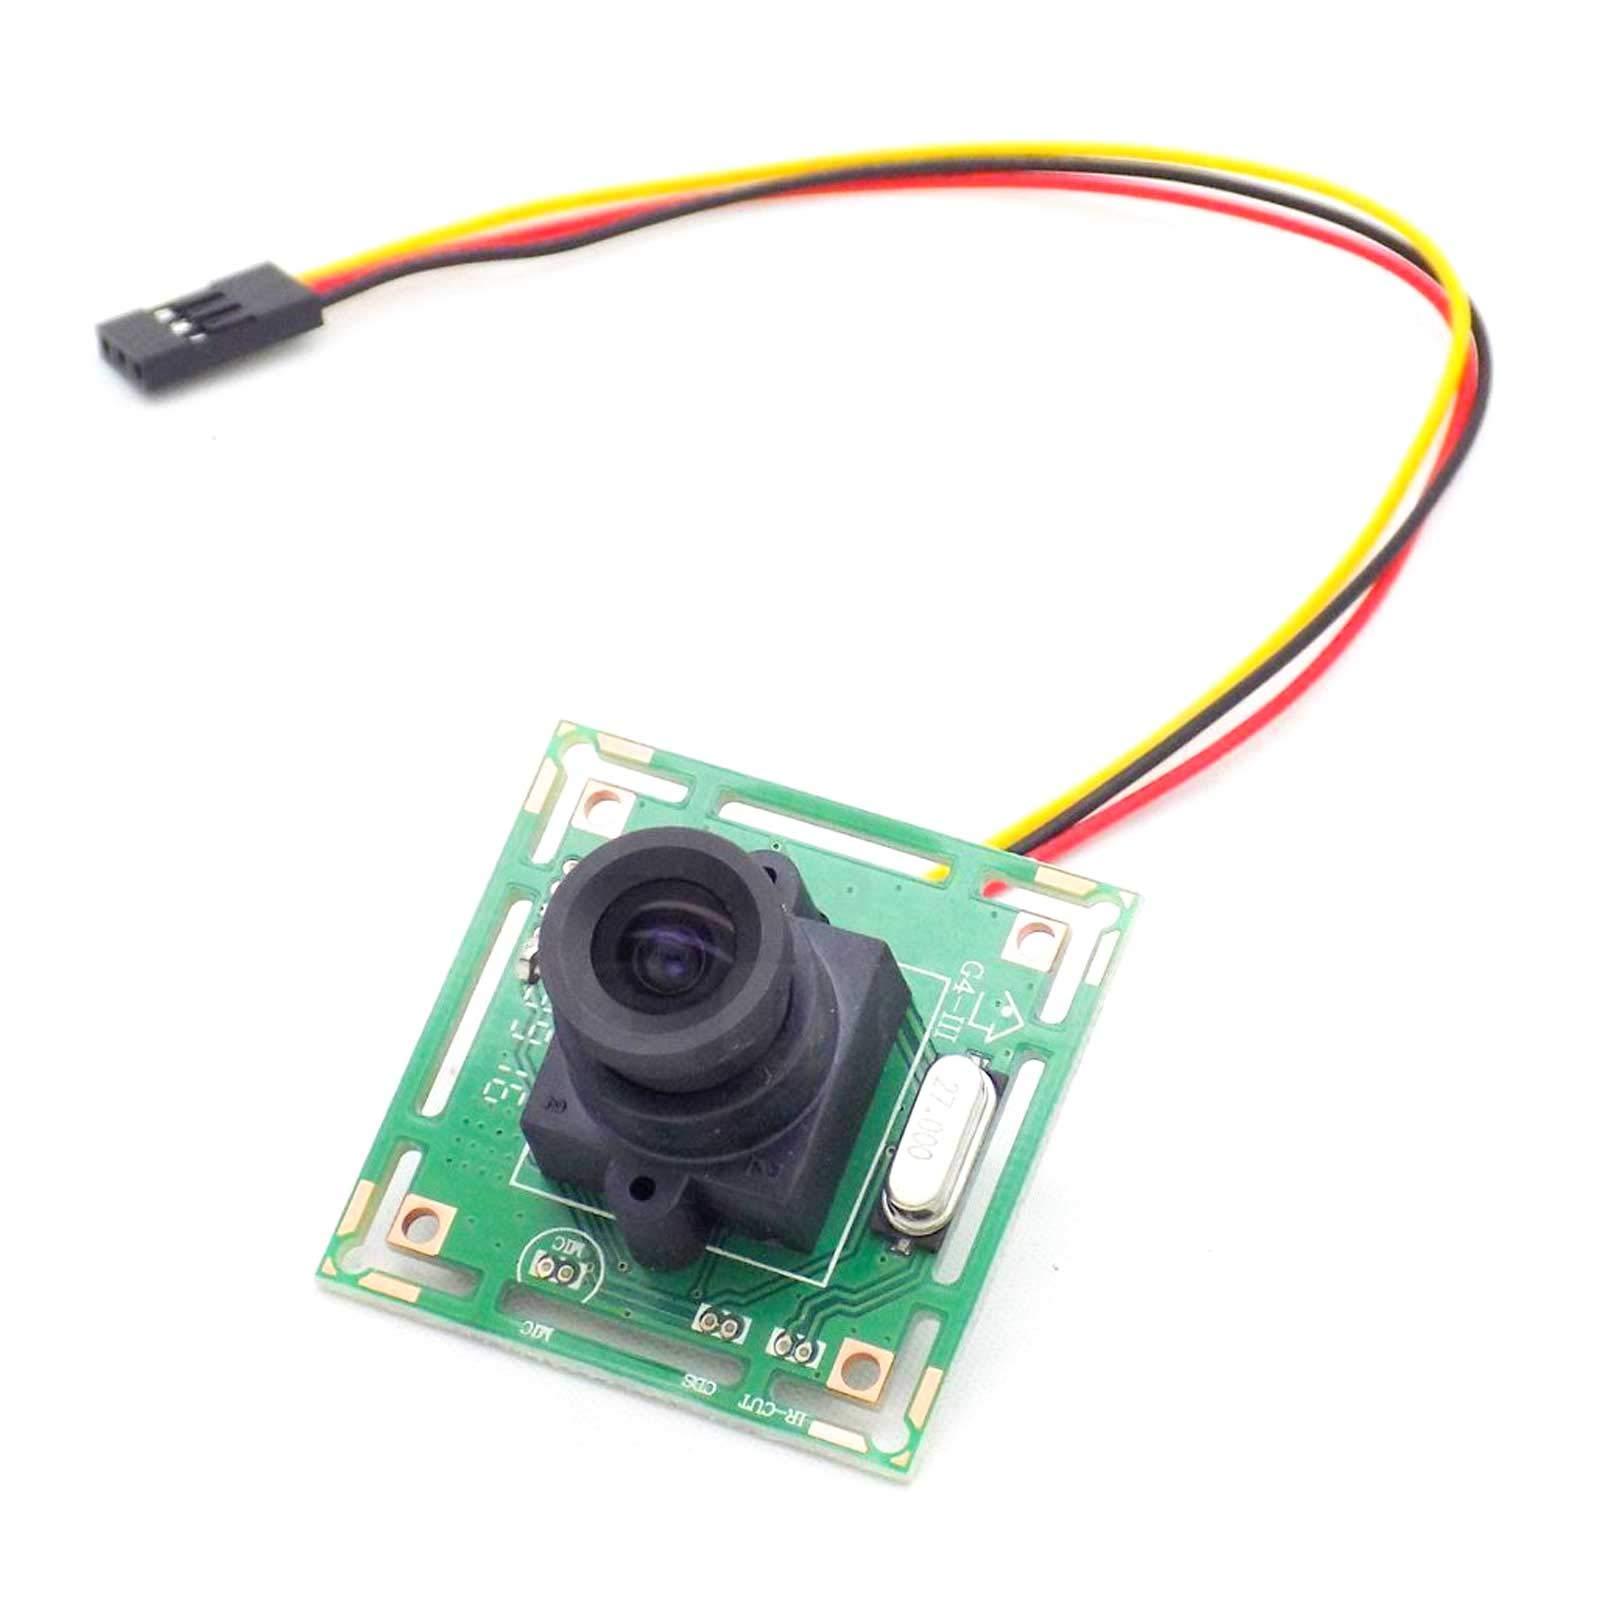 USAQ 700TVL FPV Camera 1/4 CMOS 3.6MM Lens NTSC CCTV Racing Drone HD Camera 12V